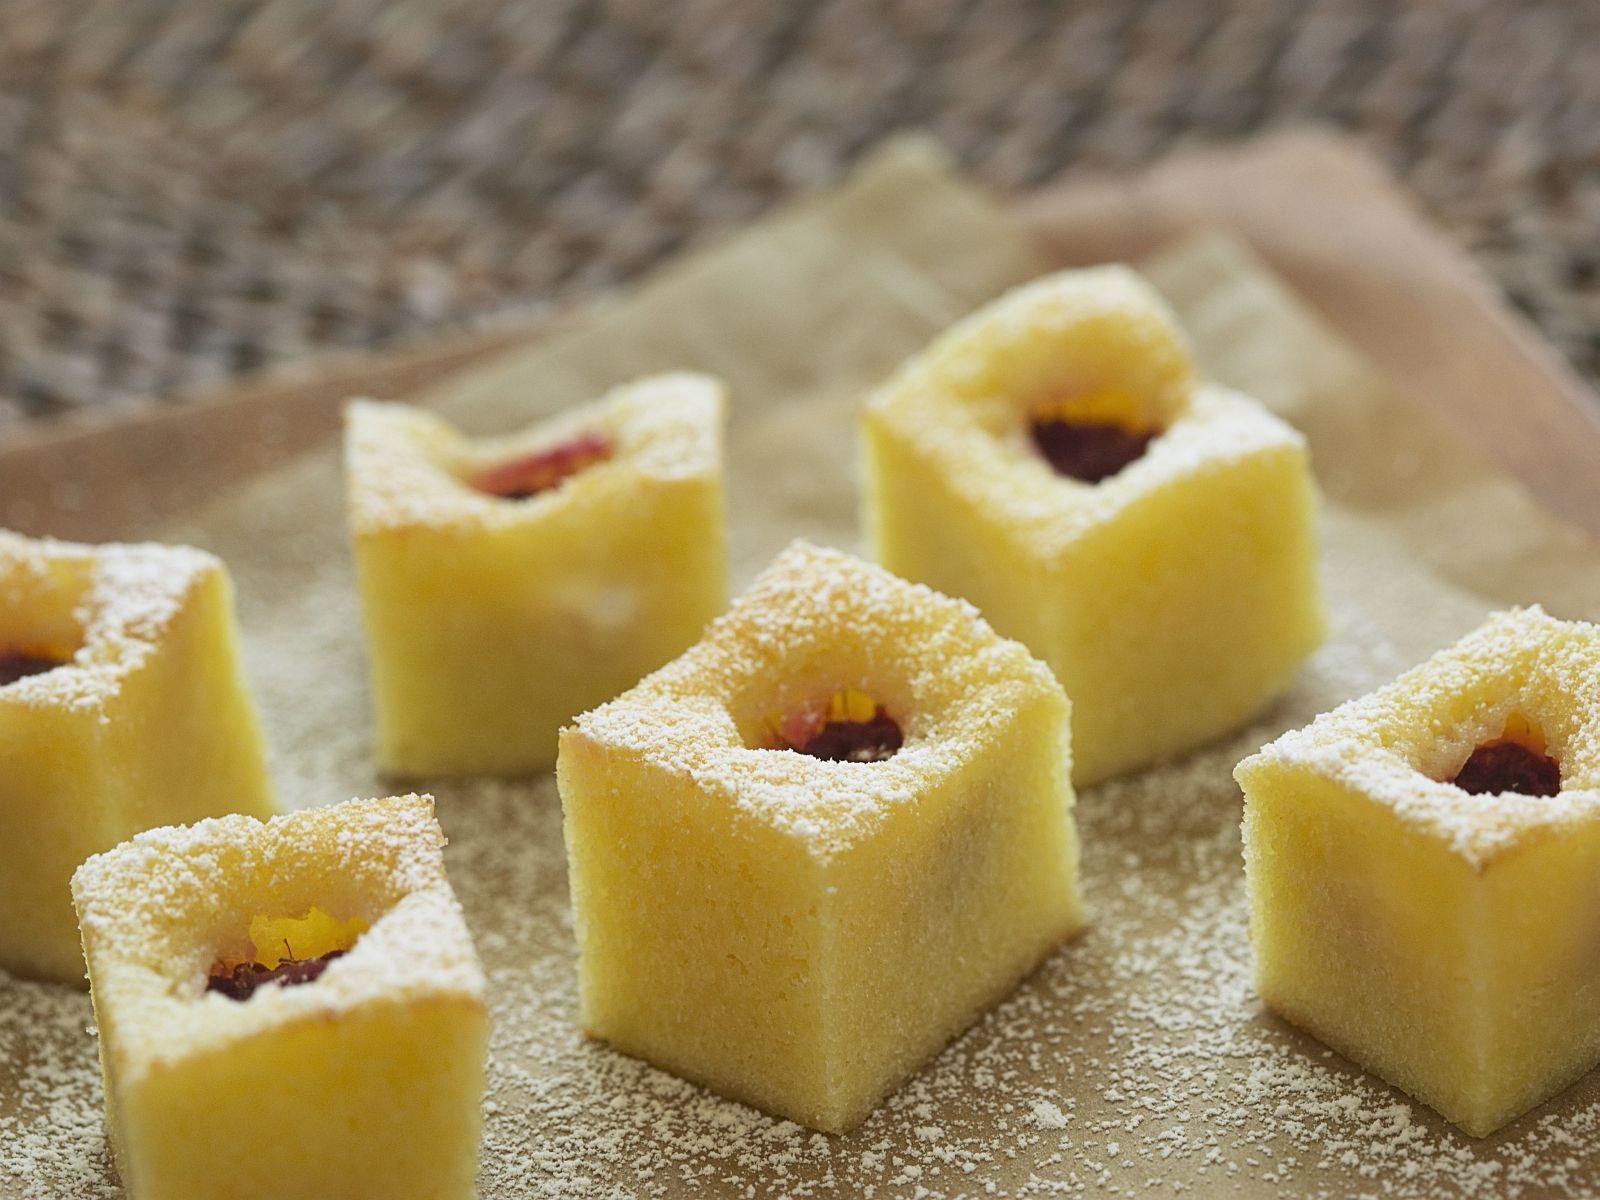 Weisser Schokoladen Himbeerkuchen Rezept Eat Smarter